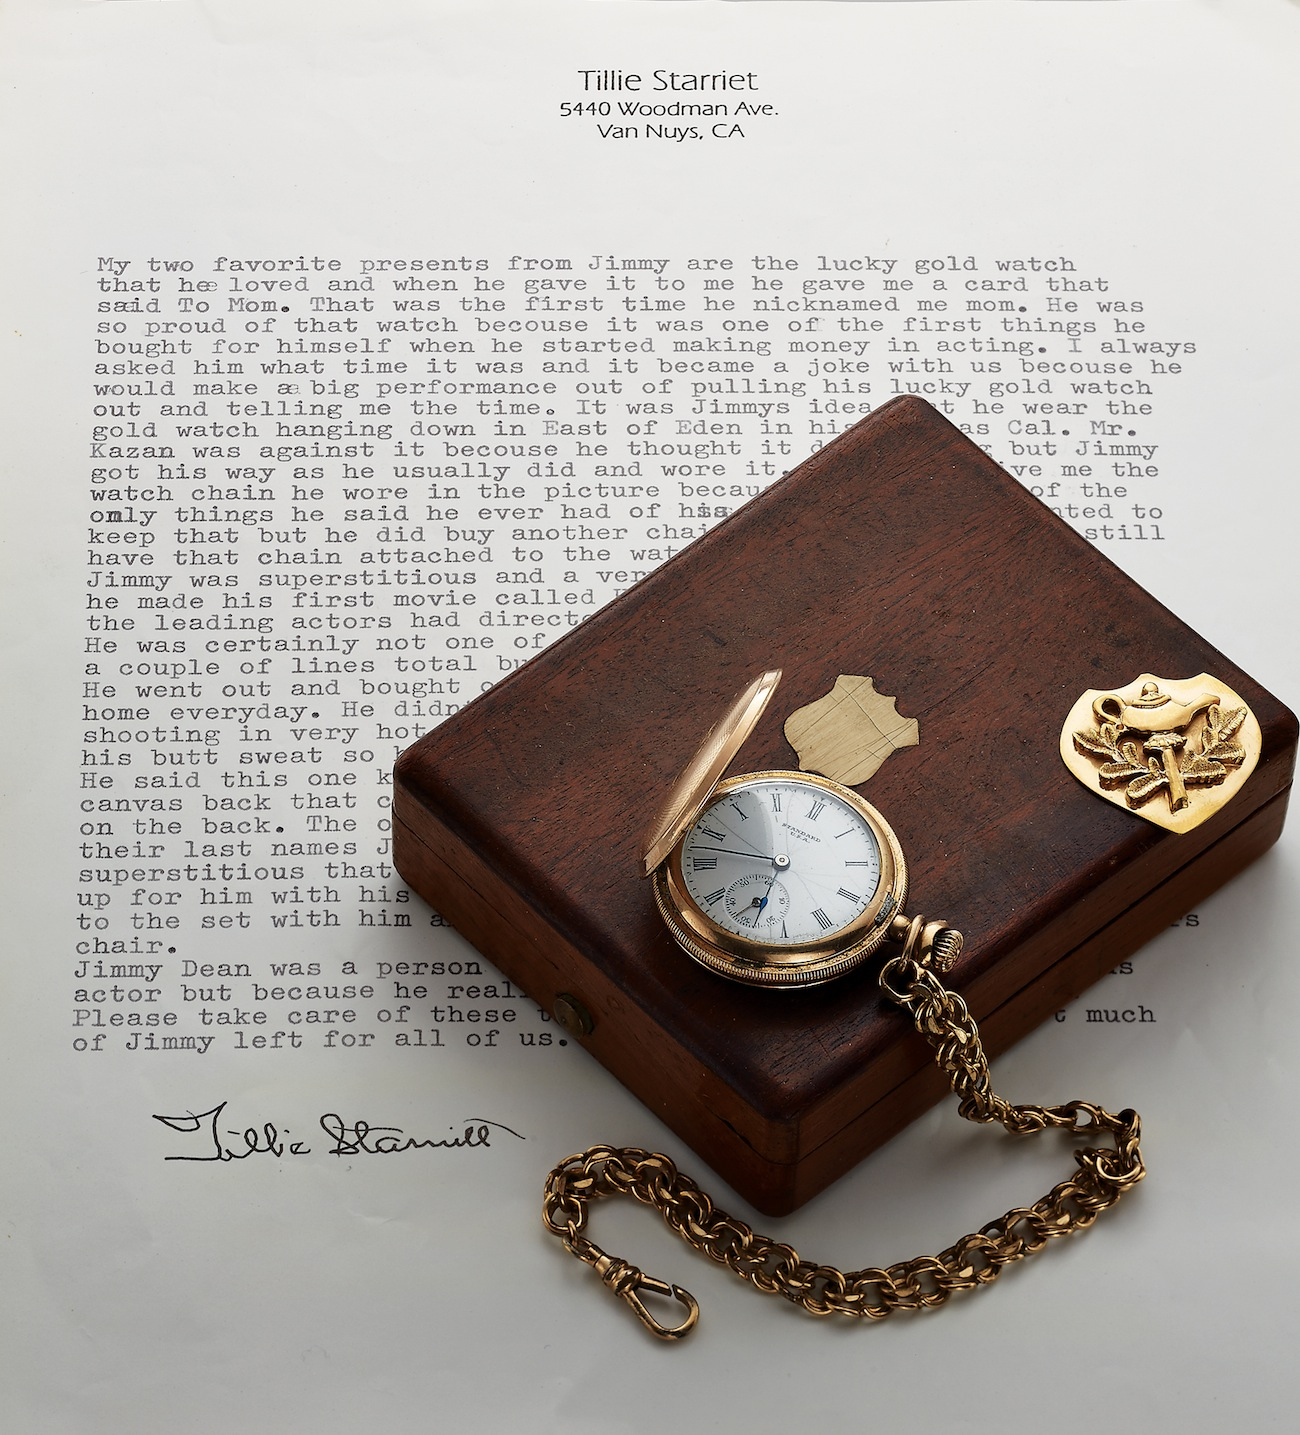 James Dean pocket watch on letter.jpg